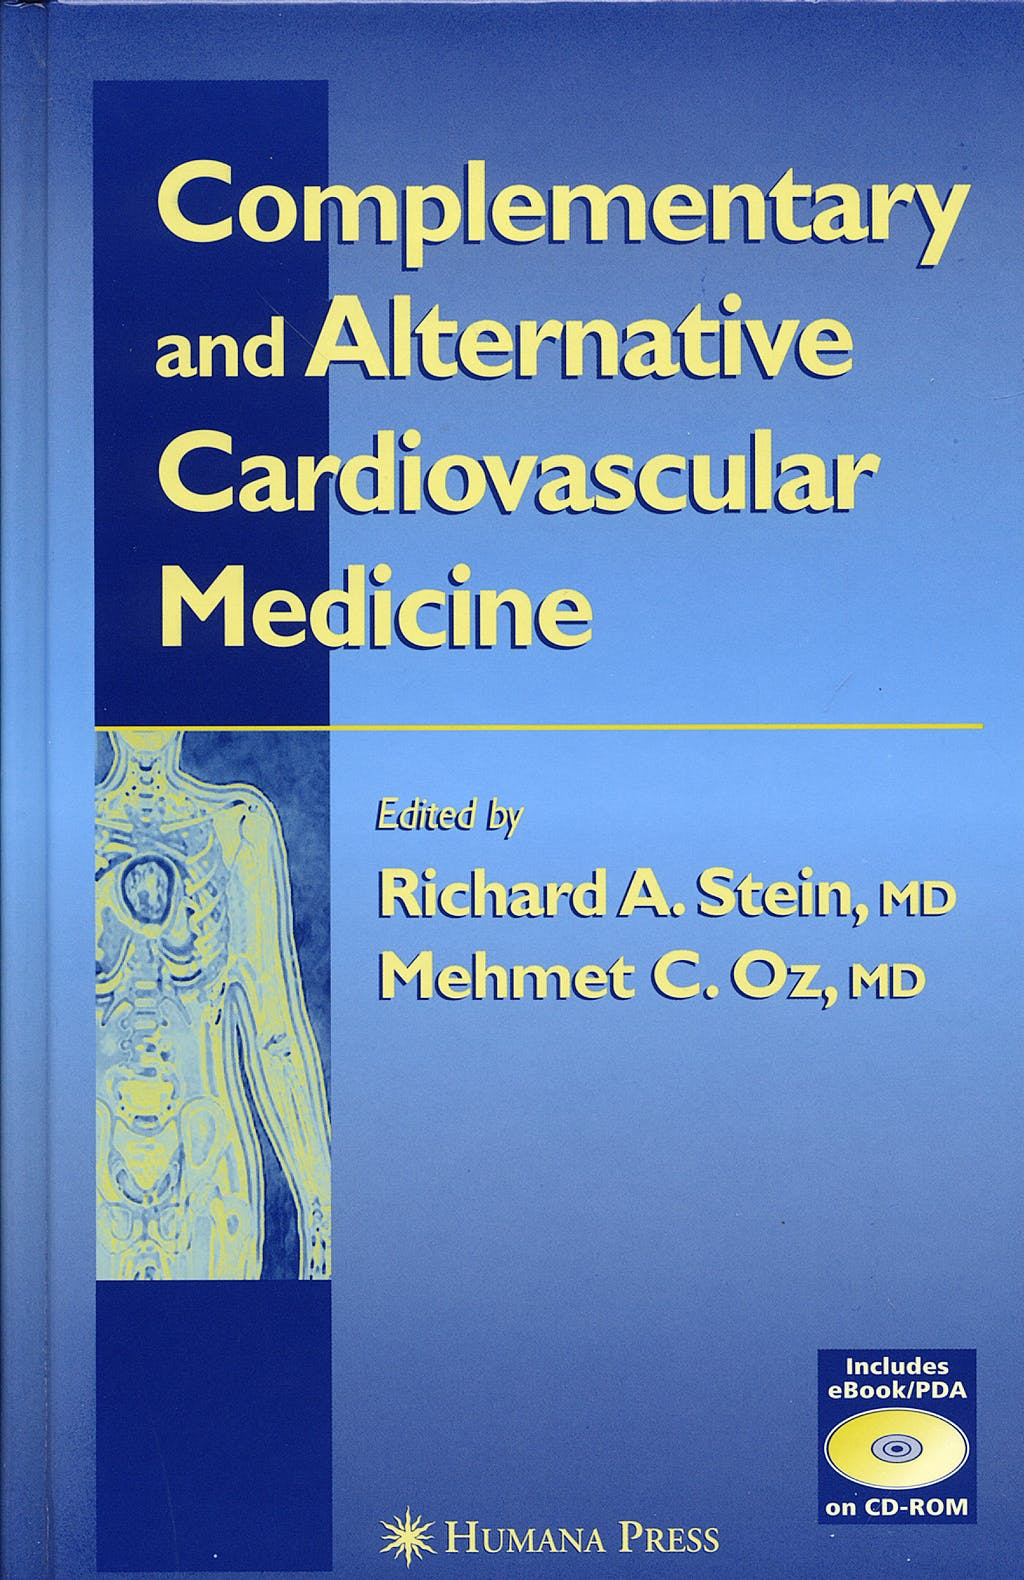 Portada del libro 9781588291868 Complementary and Alternative Cardiovascular Medicine + ebook/PDA on CD-ROM (Hardcover)